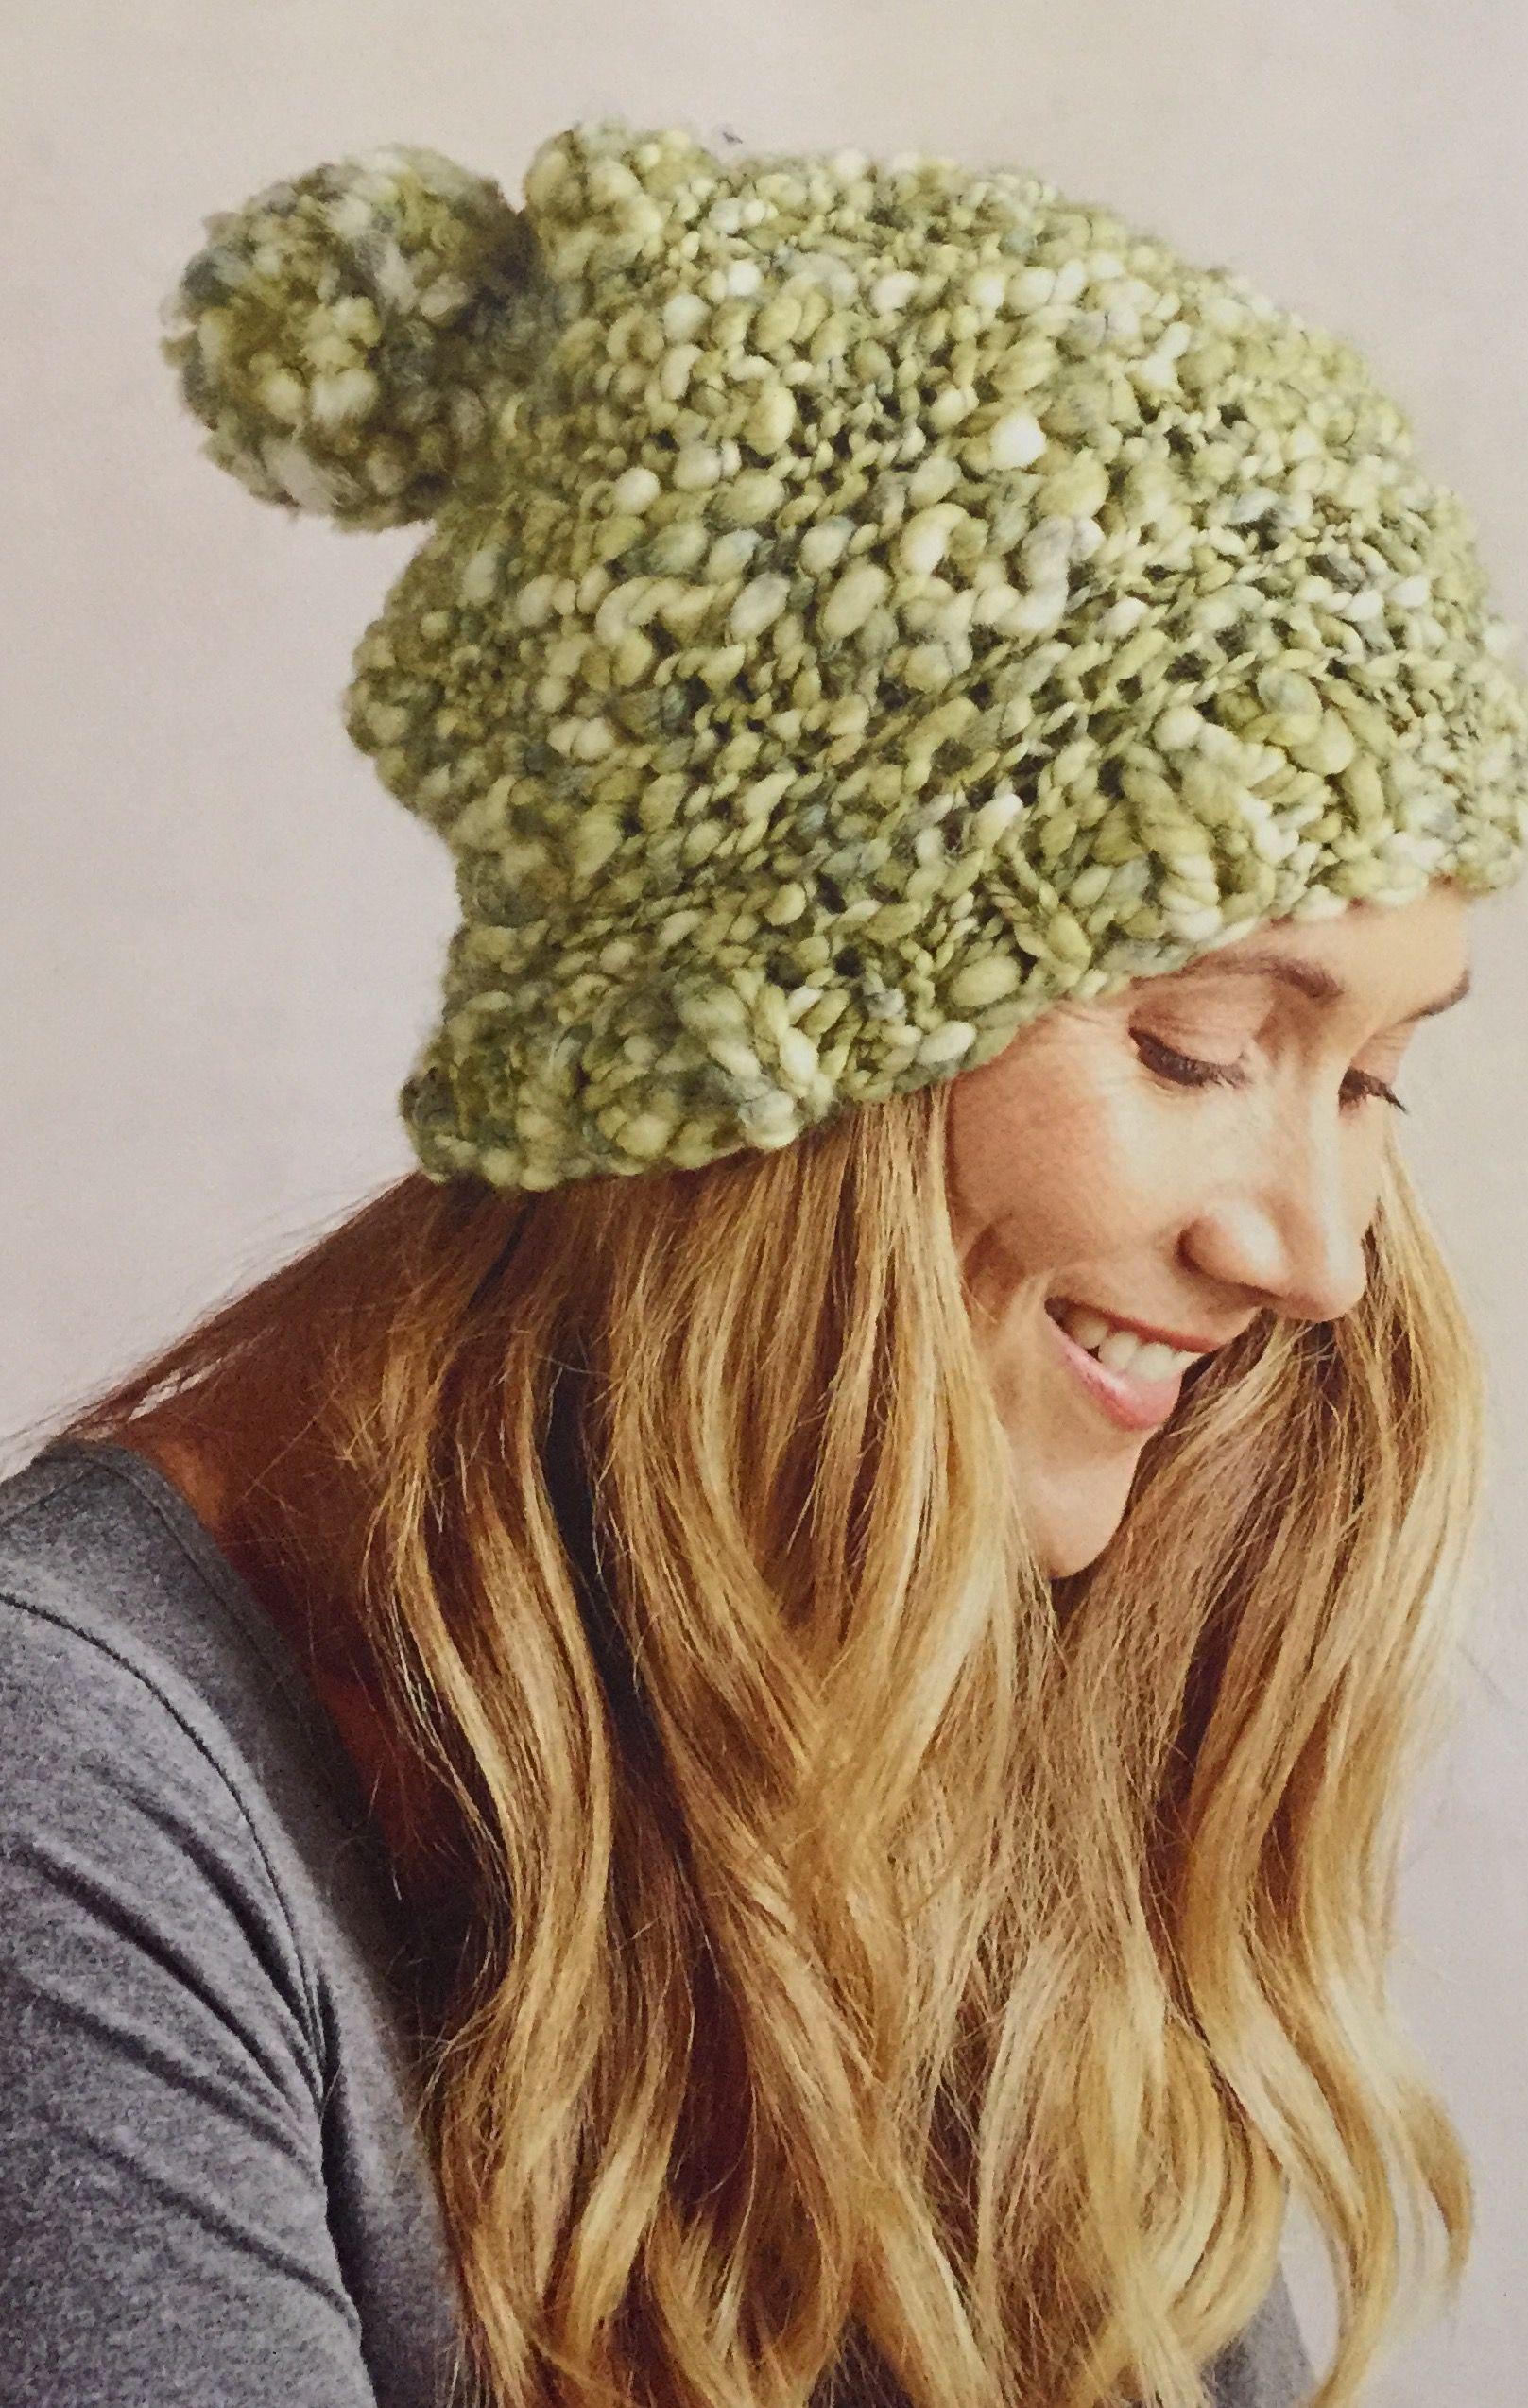 79bc92b0c72 Kald Slouchy Beanie. Knitted beanie. Spotlight Easy as Yarn magazine Winter  2016. Moda Vera Kald 12 ply 110m 100g x 2